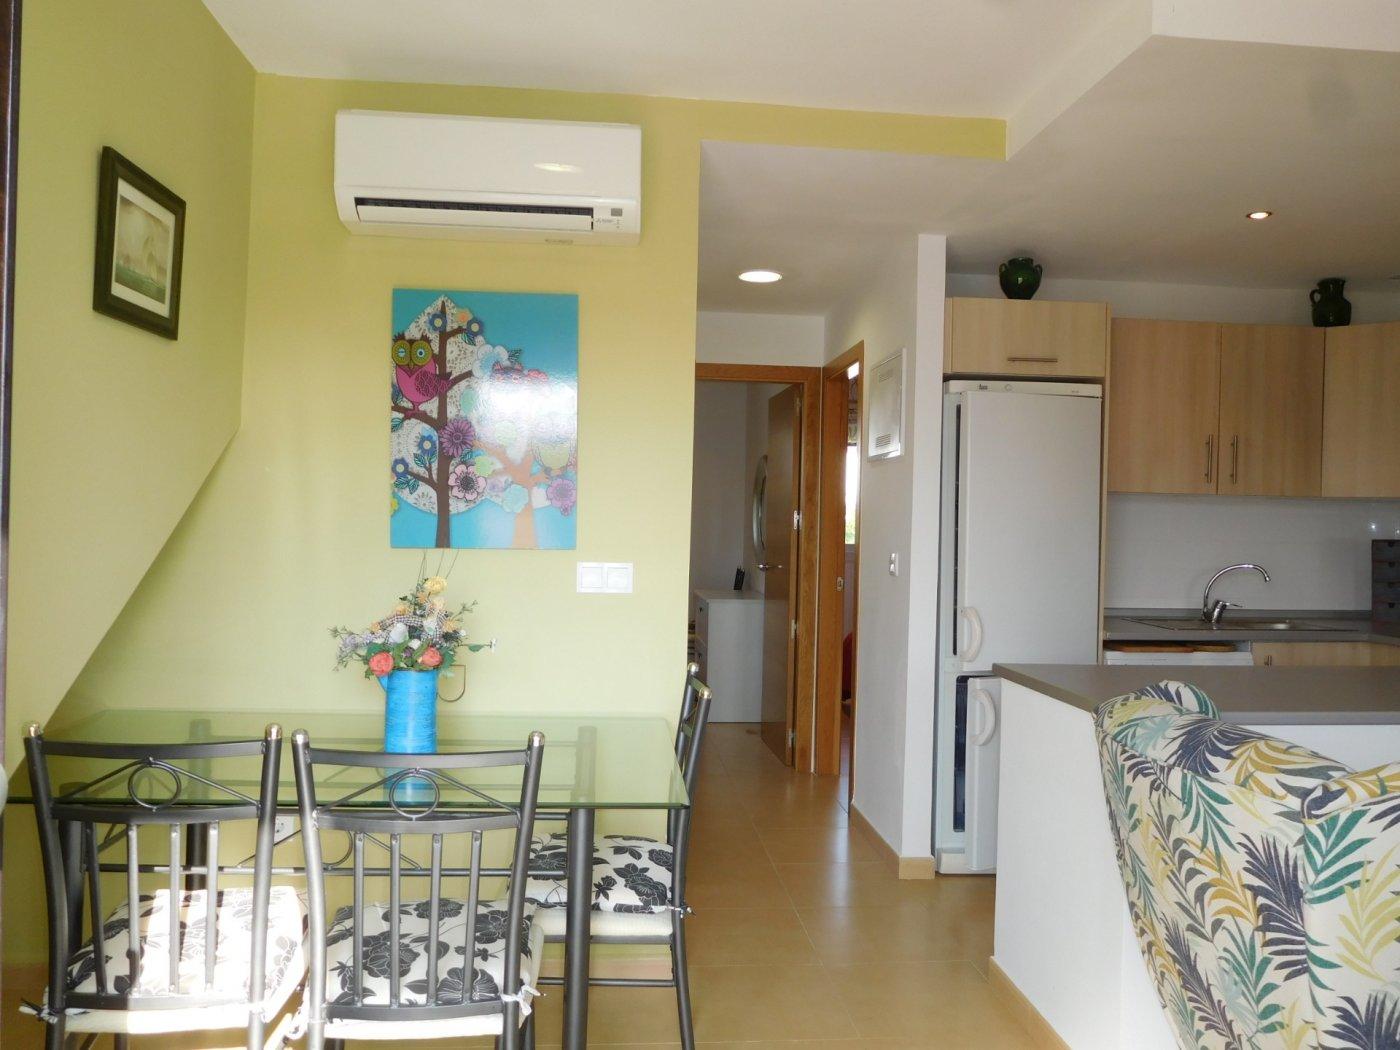 Image 1 Amarre ref 3265-03033 for rent in Condado De Alhama Spain - Quality Homes Costa Cálida